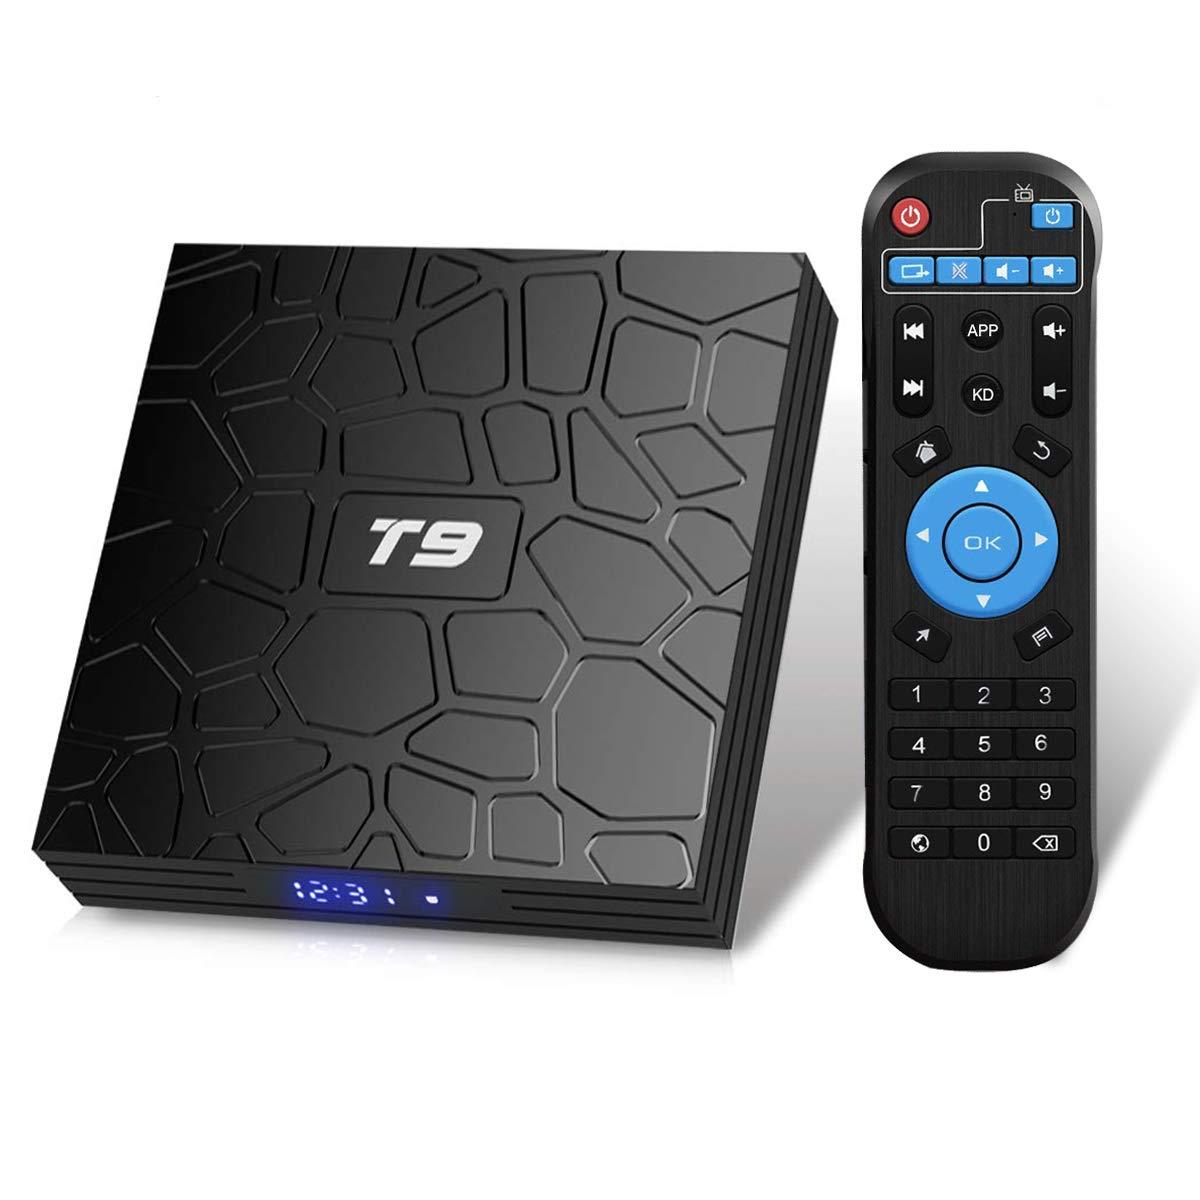 Android TV Box T9 Android 9.0 TV Box 4 GB RAM / 32 GB ROM RK3318 Quad-Core Soporte 2.4/5 Ghz WiFi BT4.0 4K 3D HDMI DLNA Smart TV Box: Amazon.es: Electrónica